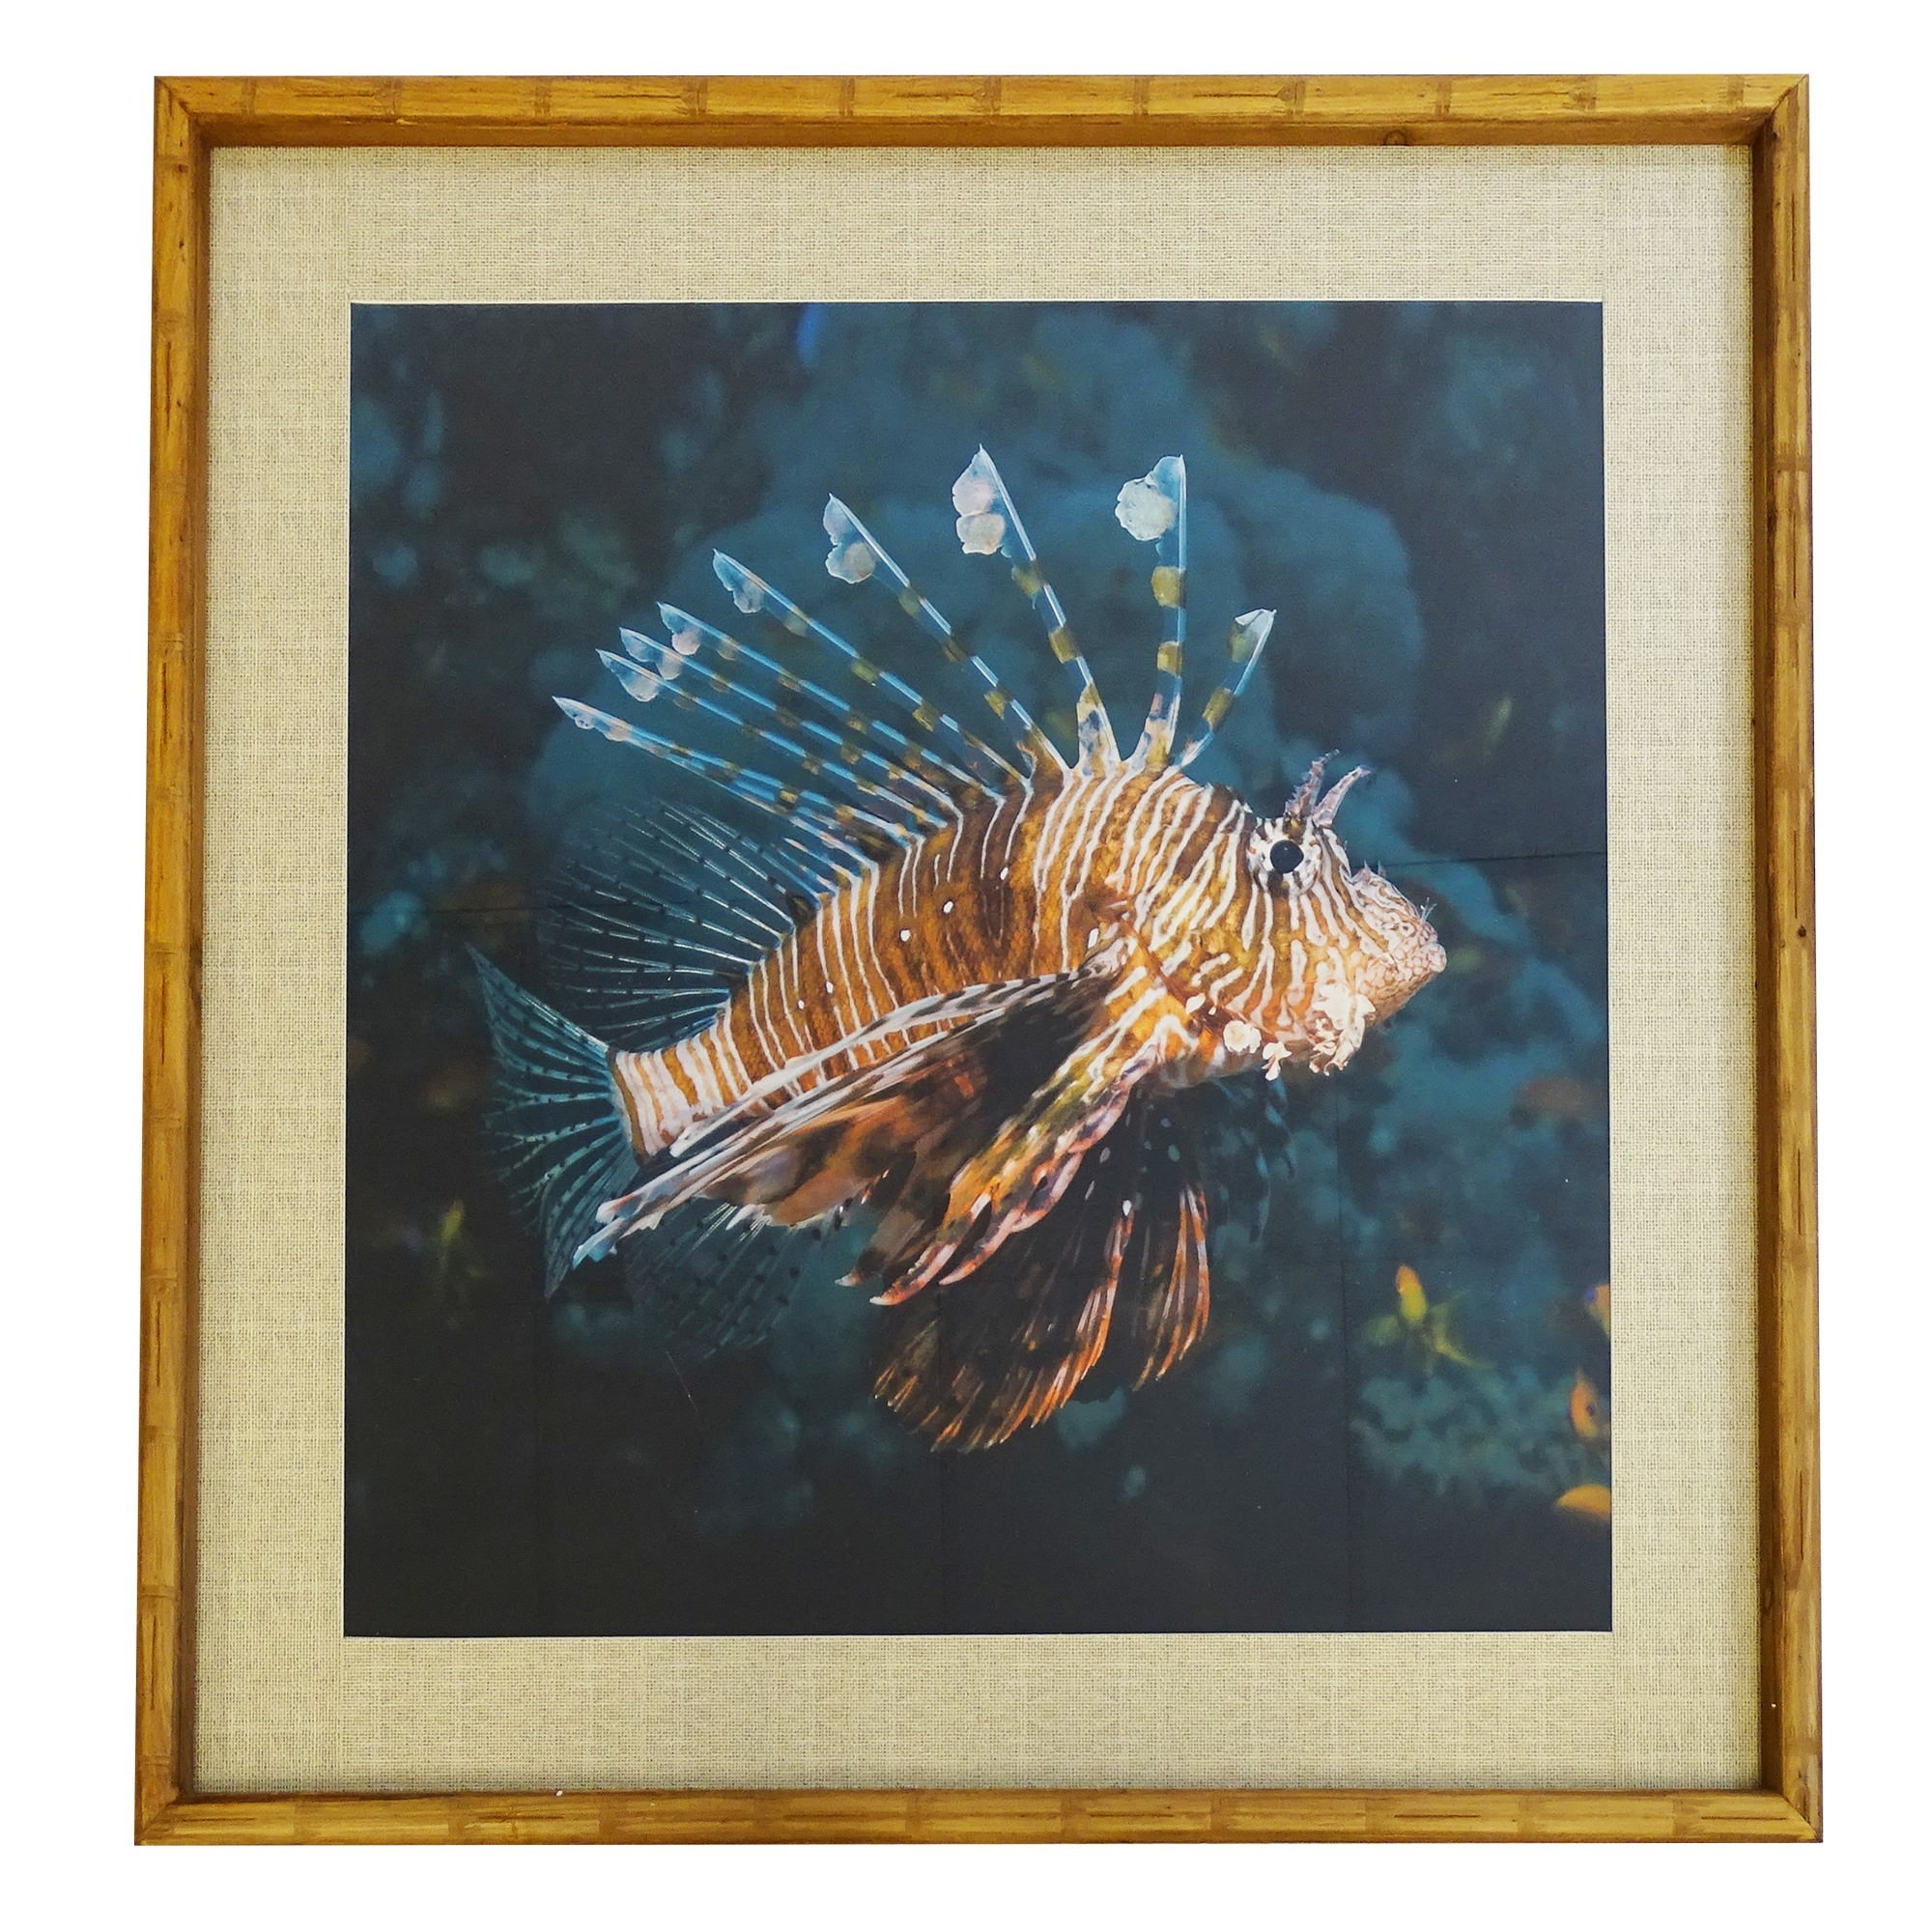 Chavez Bamboo Framed Wall Art Print, Lion Fish, 100cm